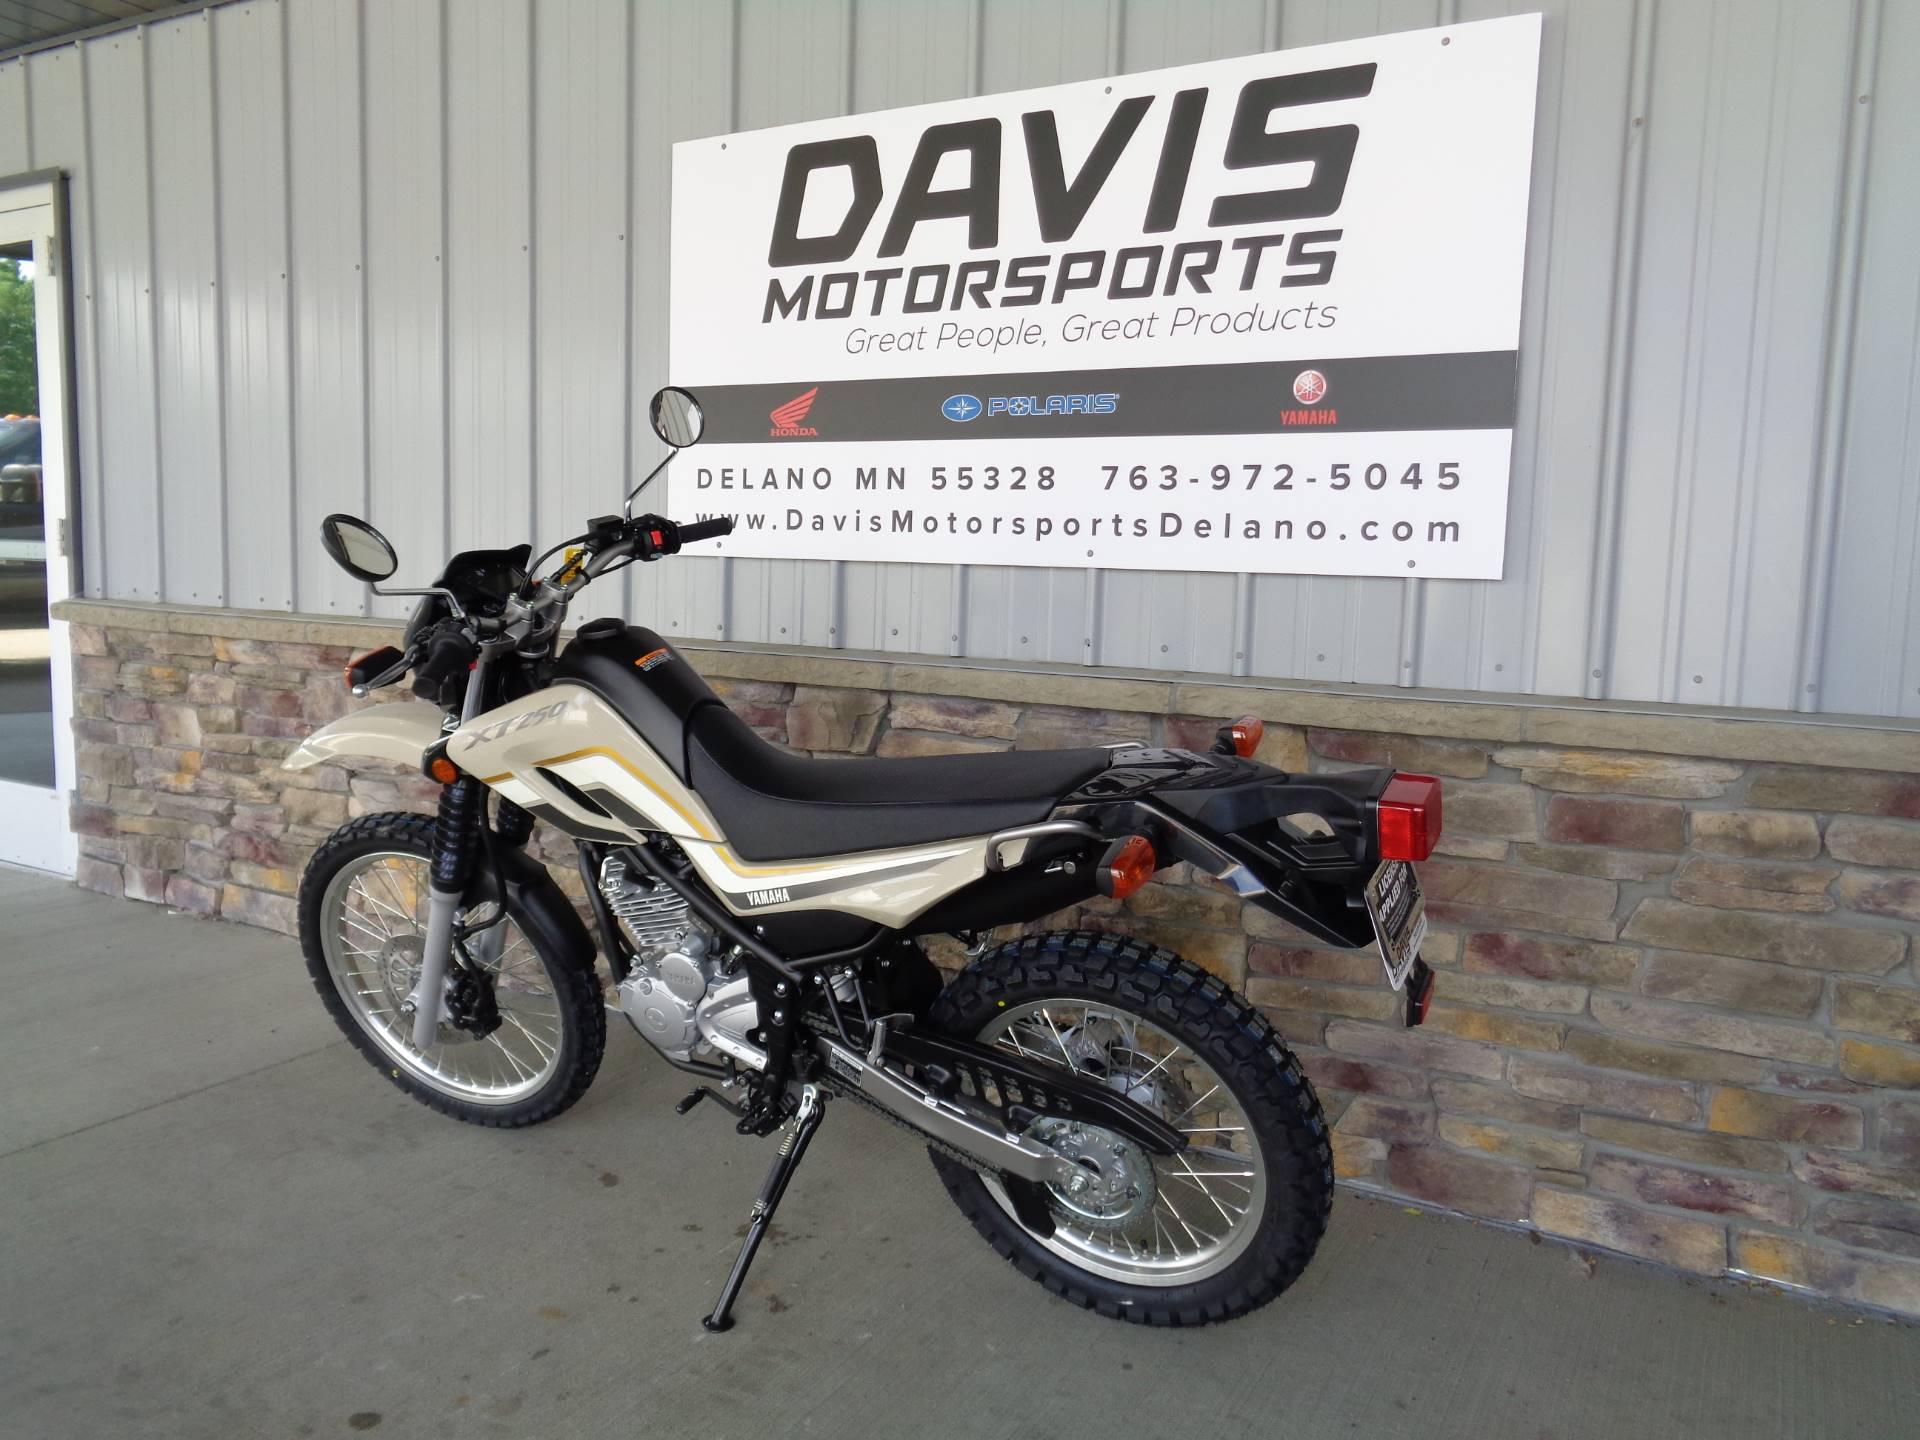 New 2019 Yamaha XT250 | Motorcycles in Delano MN | N/A ...